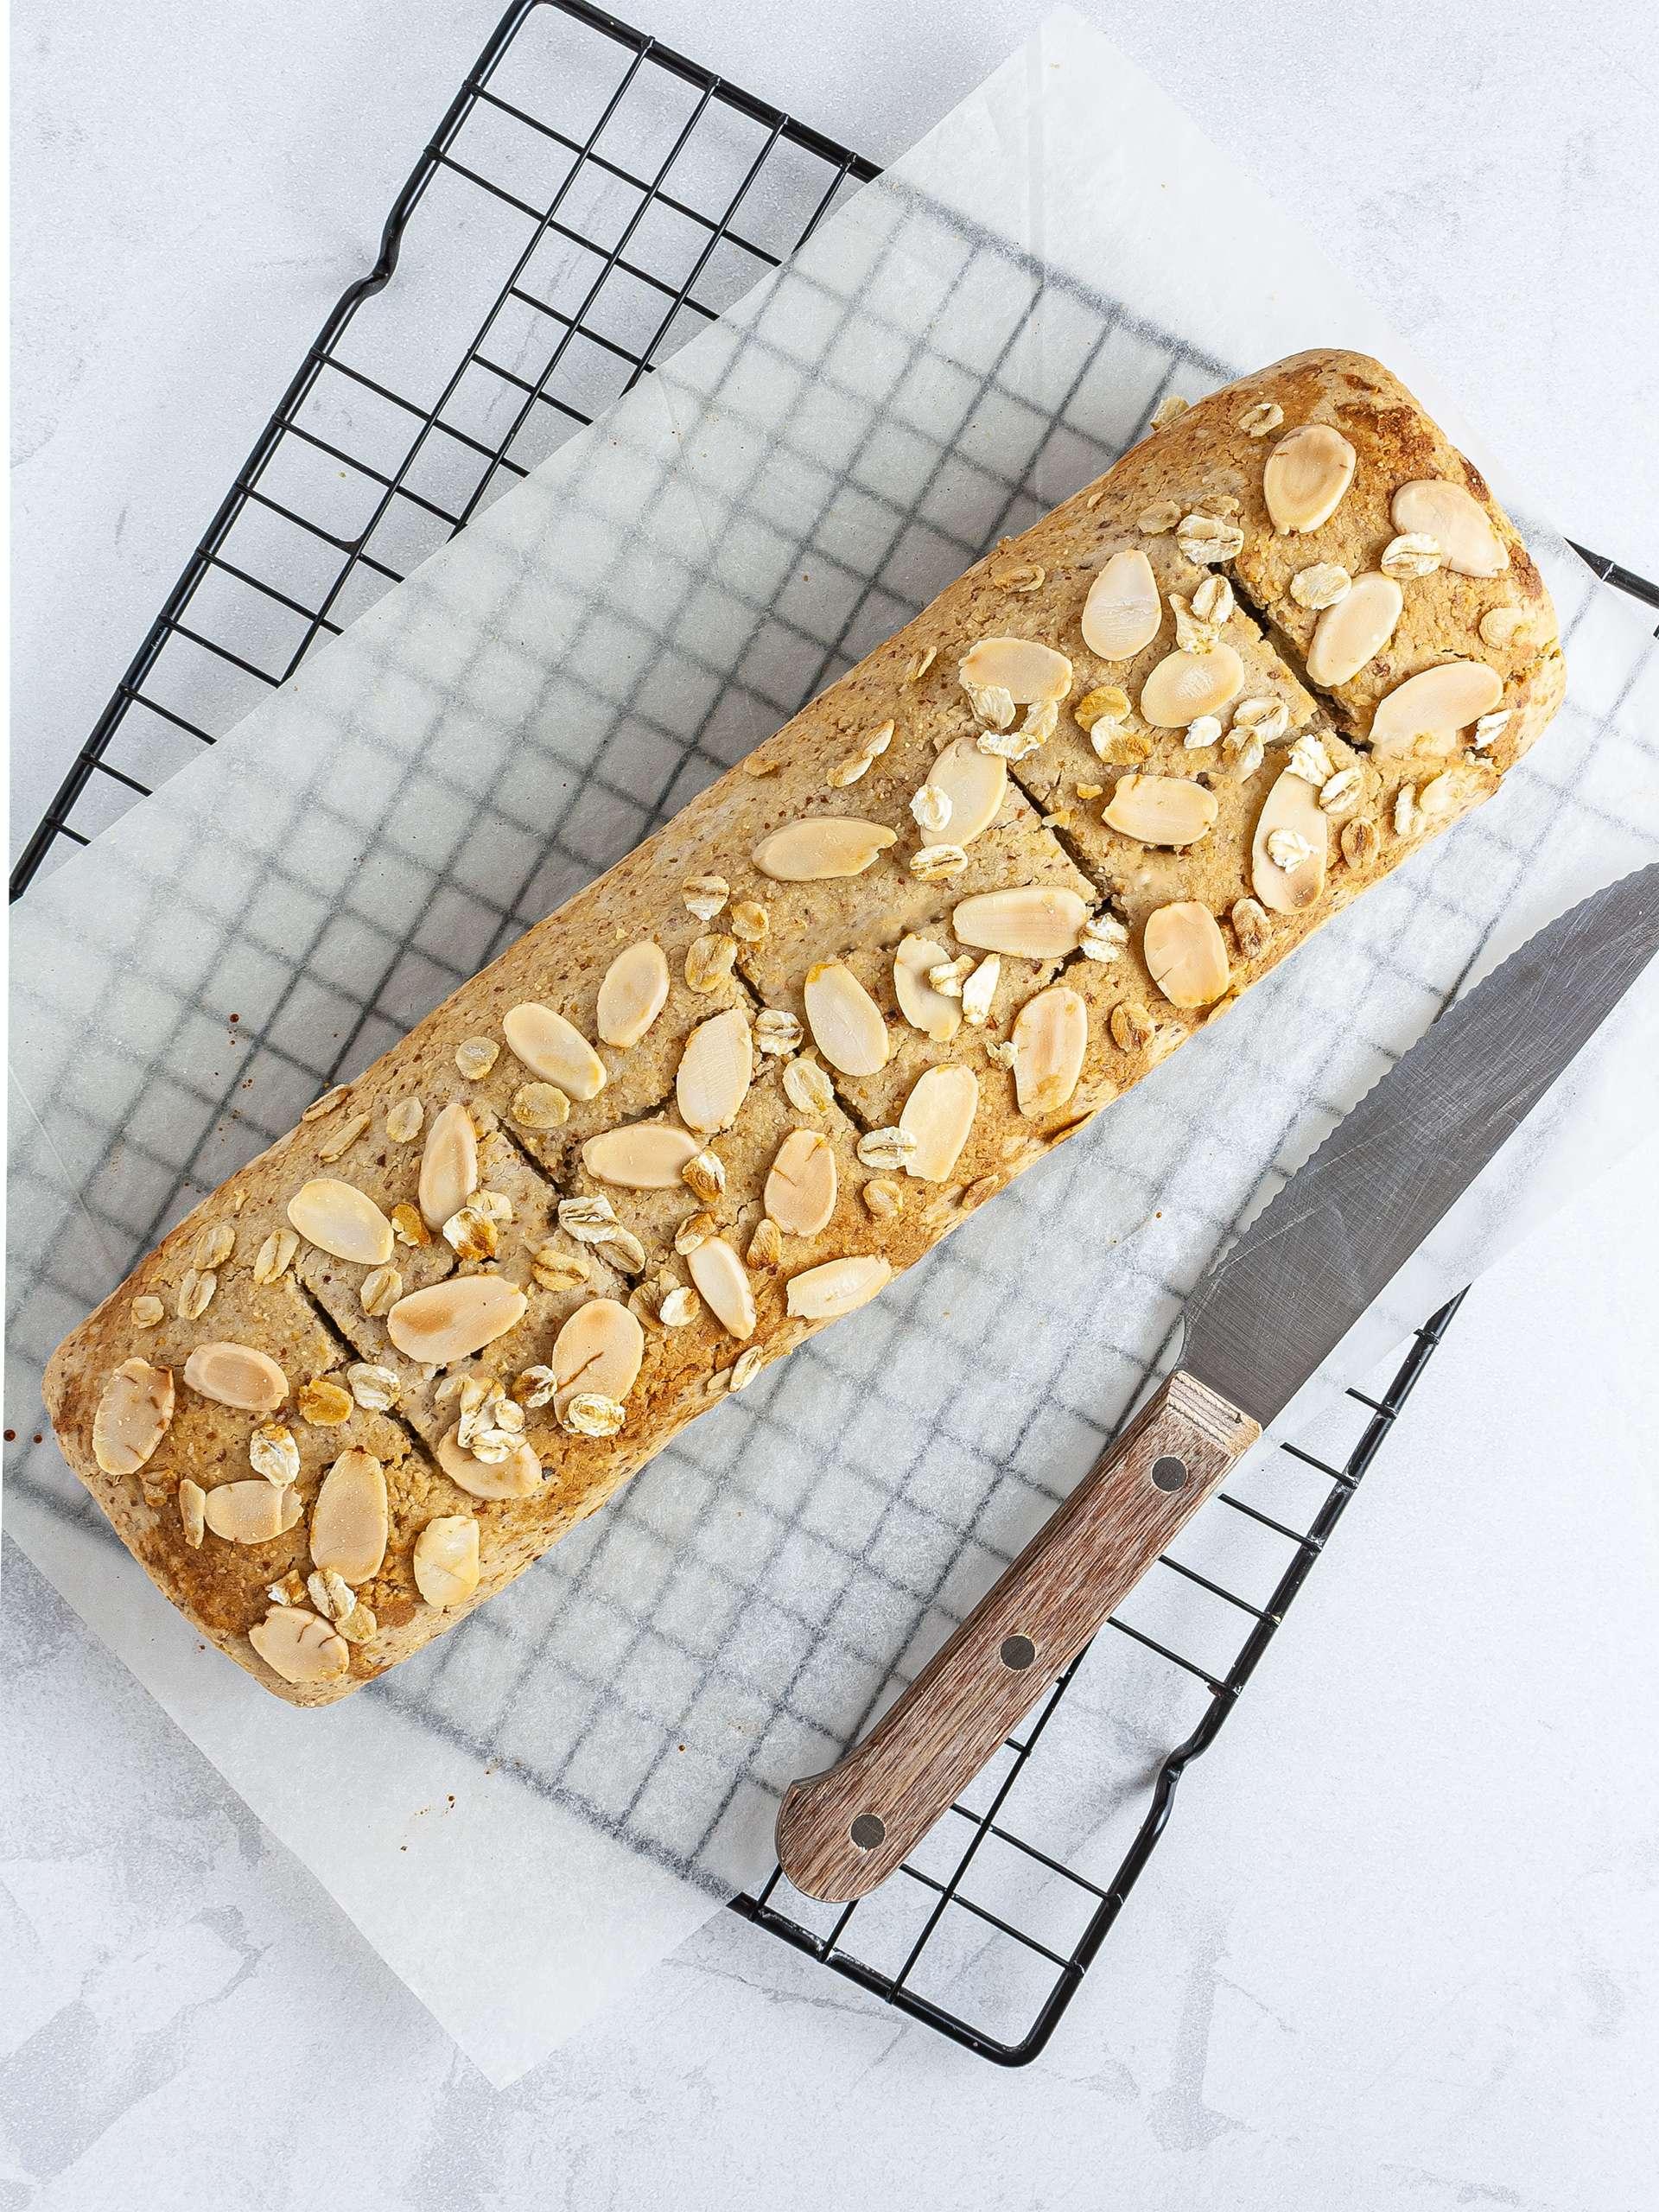 Baked gluten-free strudel